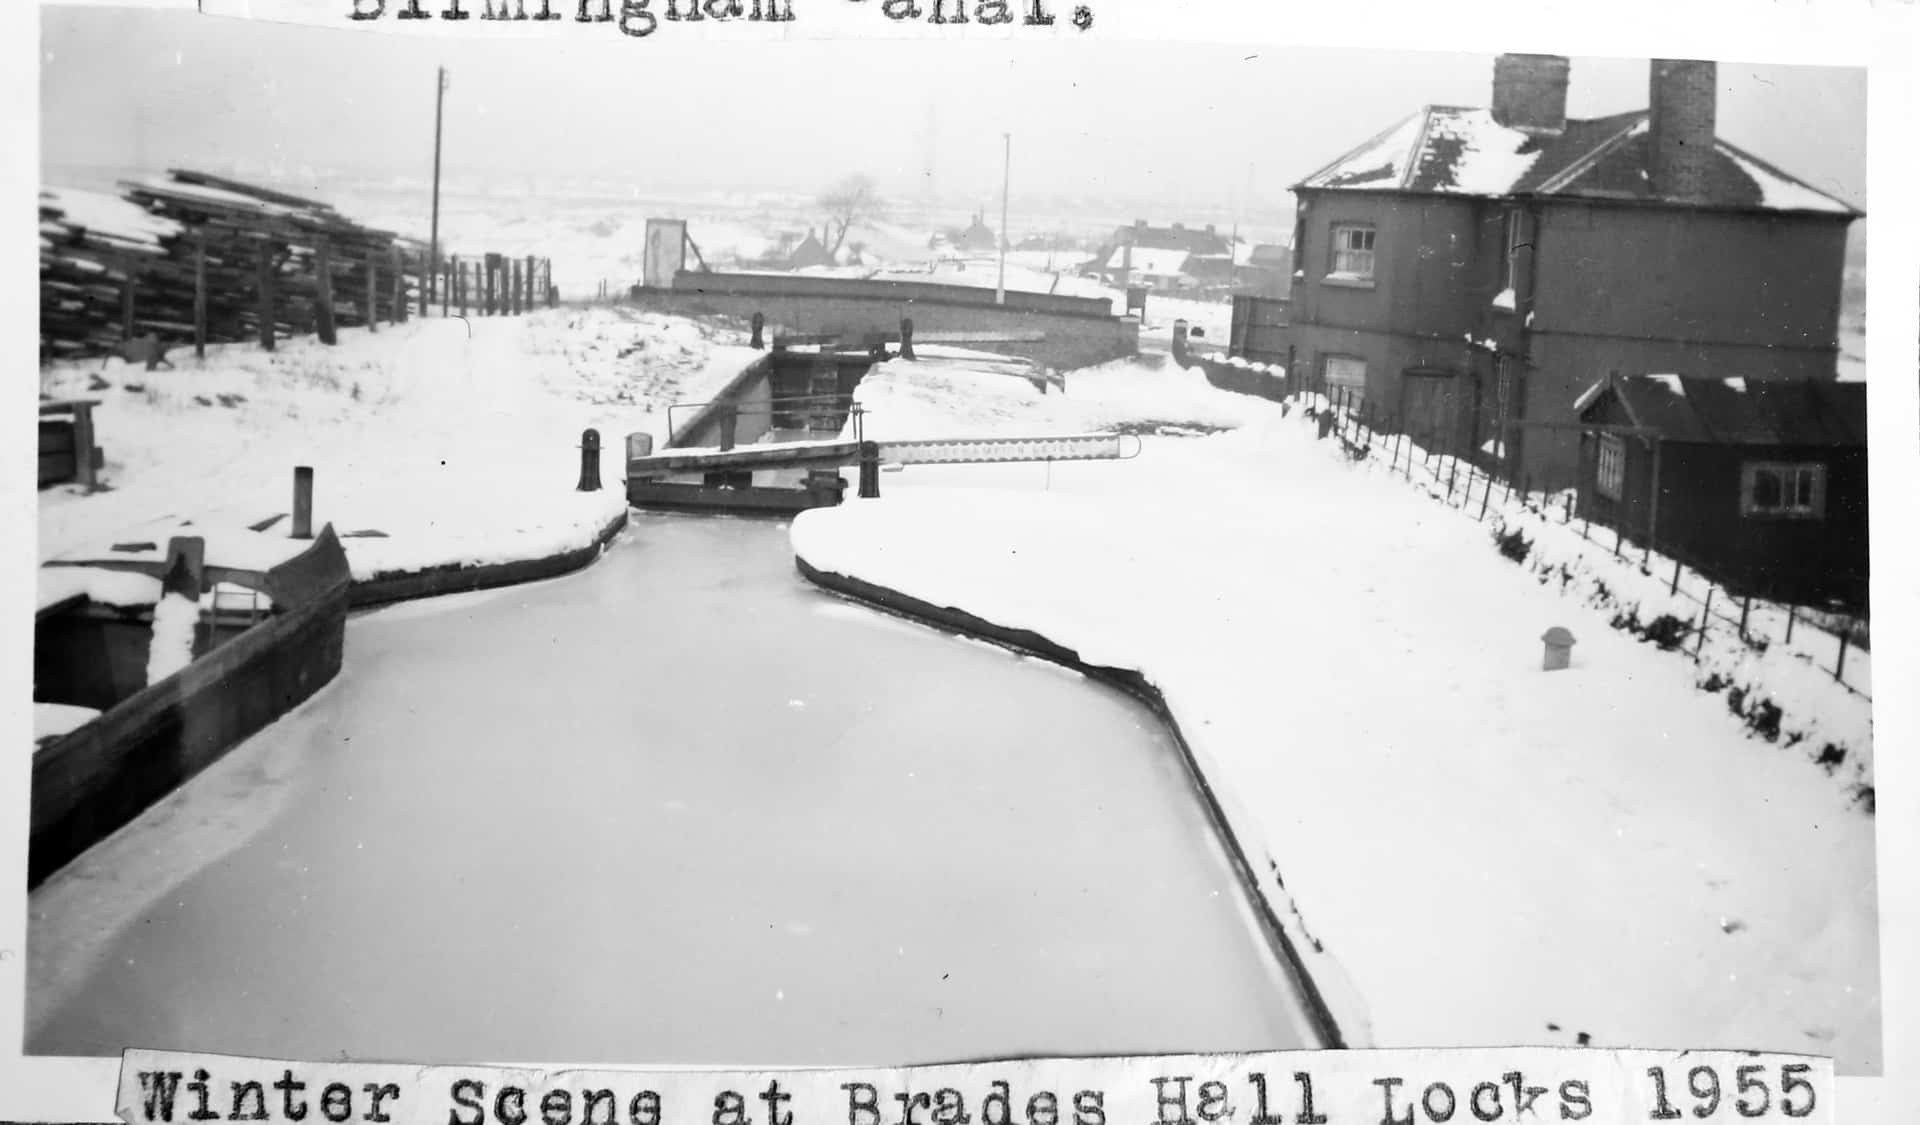 Winter scene at Brades Hall Locks 1955